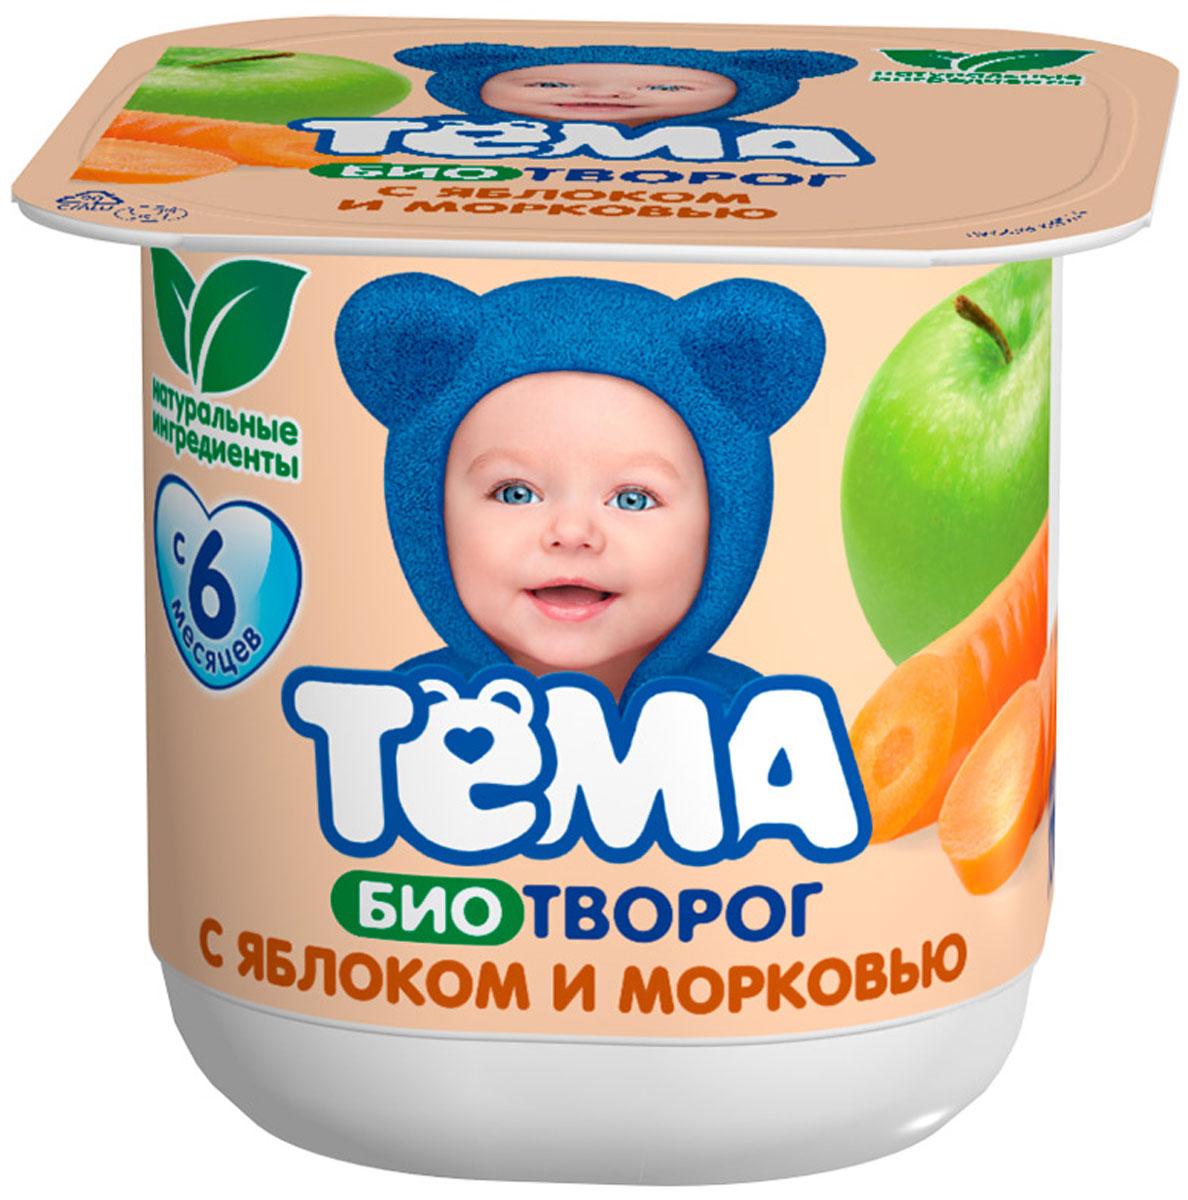 Тема Биотворог Яблоко морковь 4,2%, 100 г молоко тёма 3 2